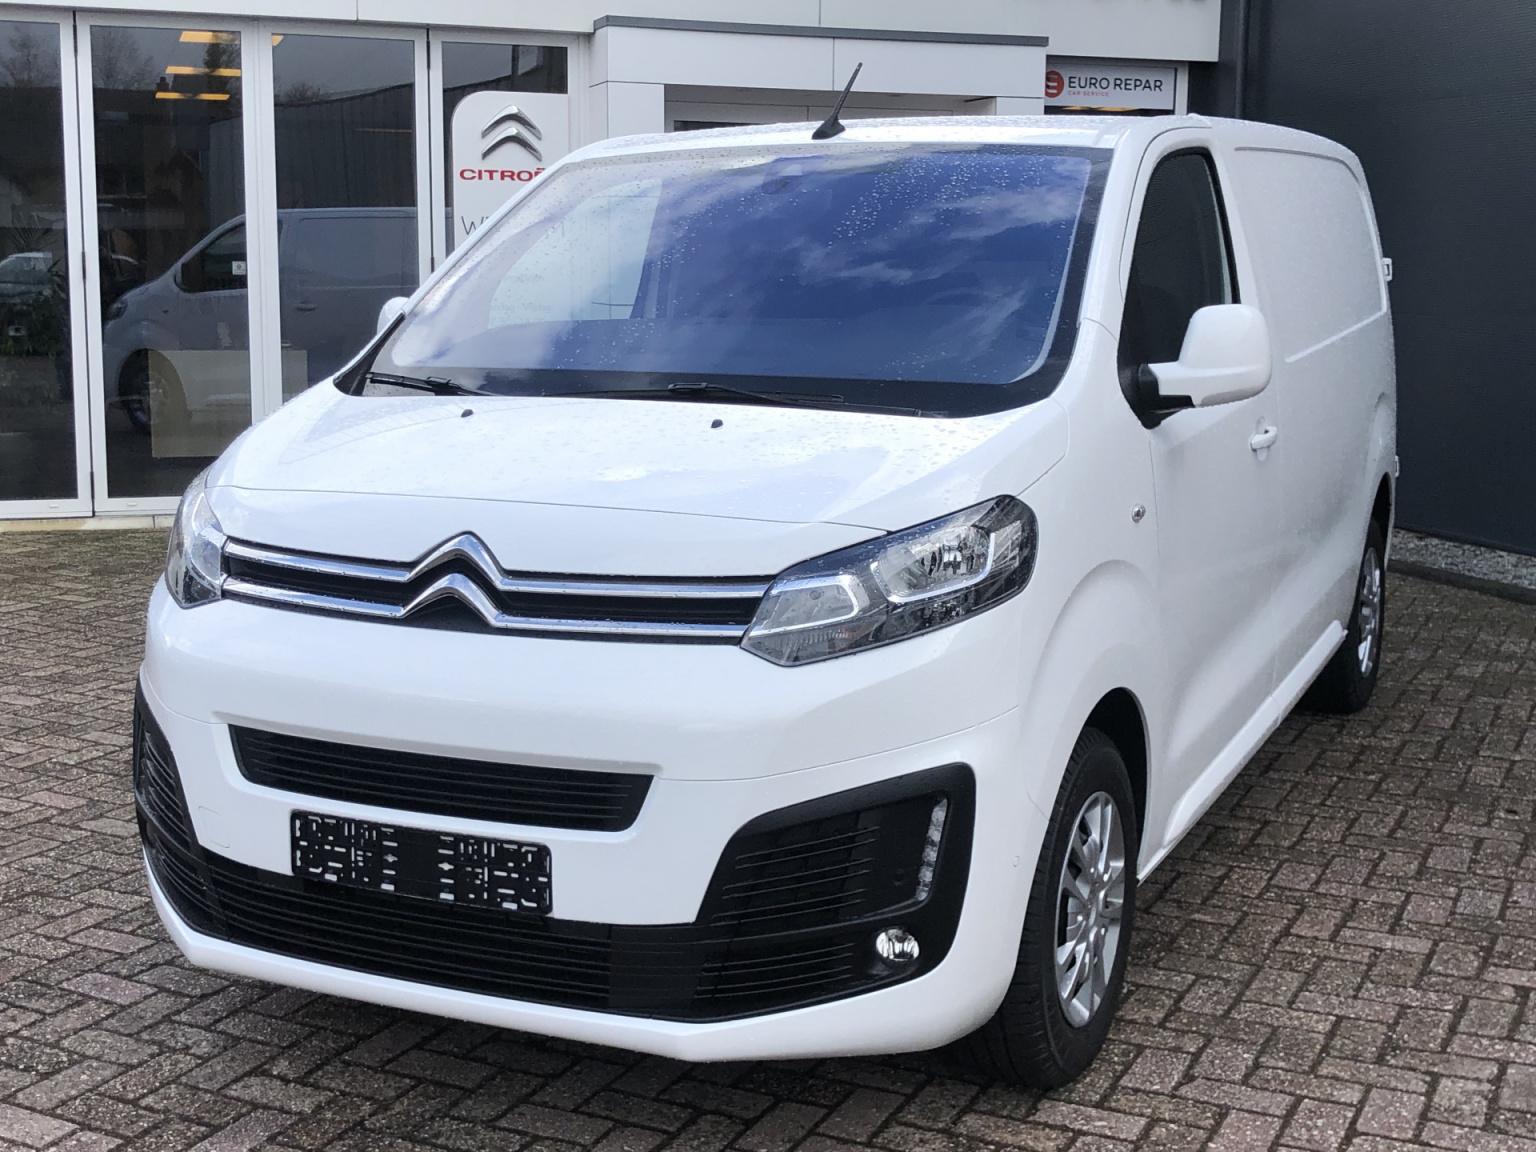 Citroën-Jumpy-2